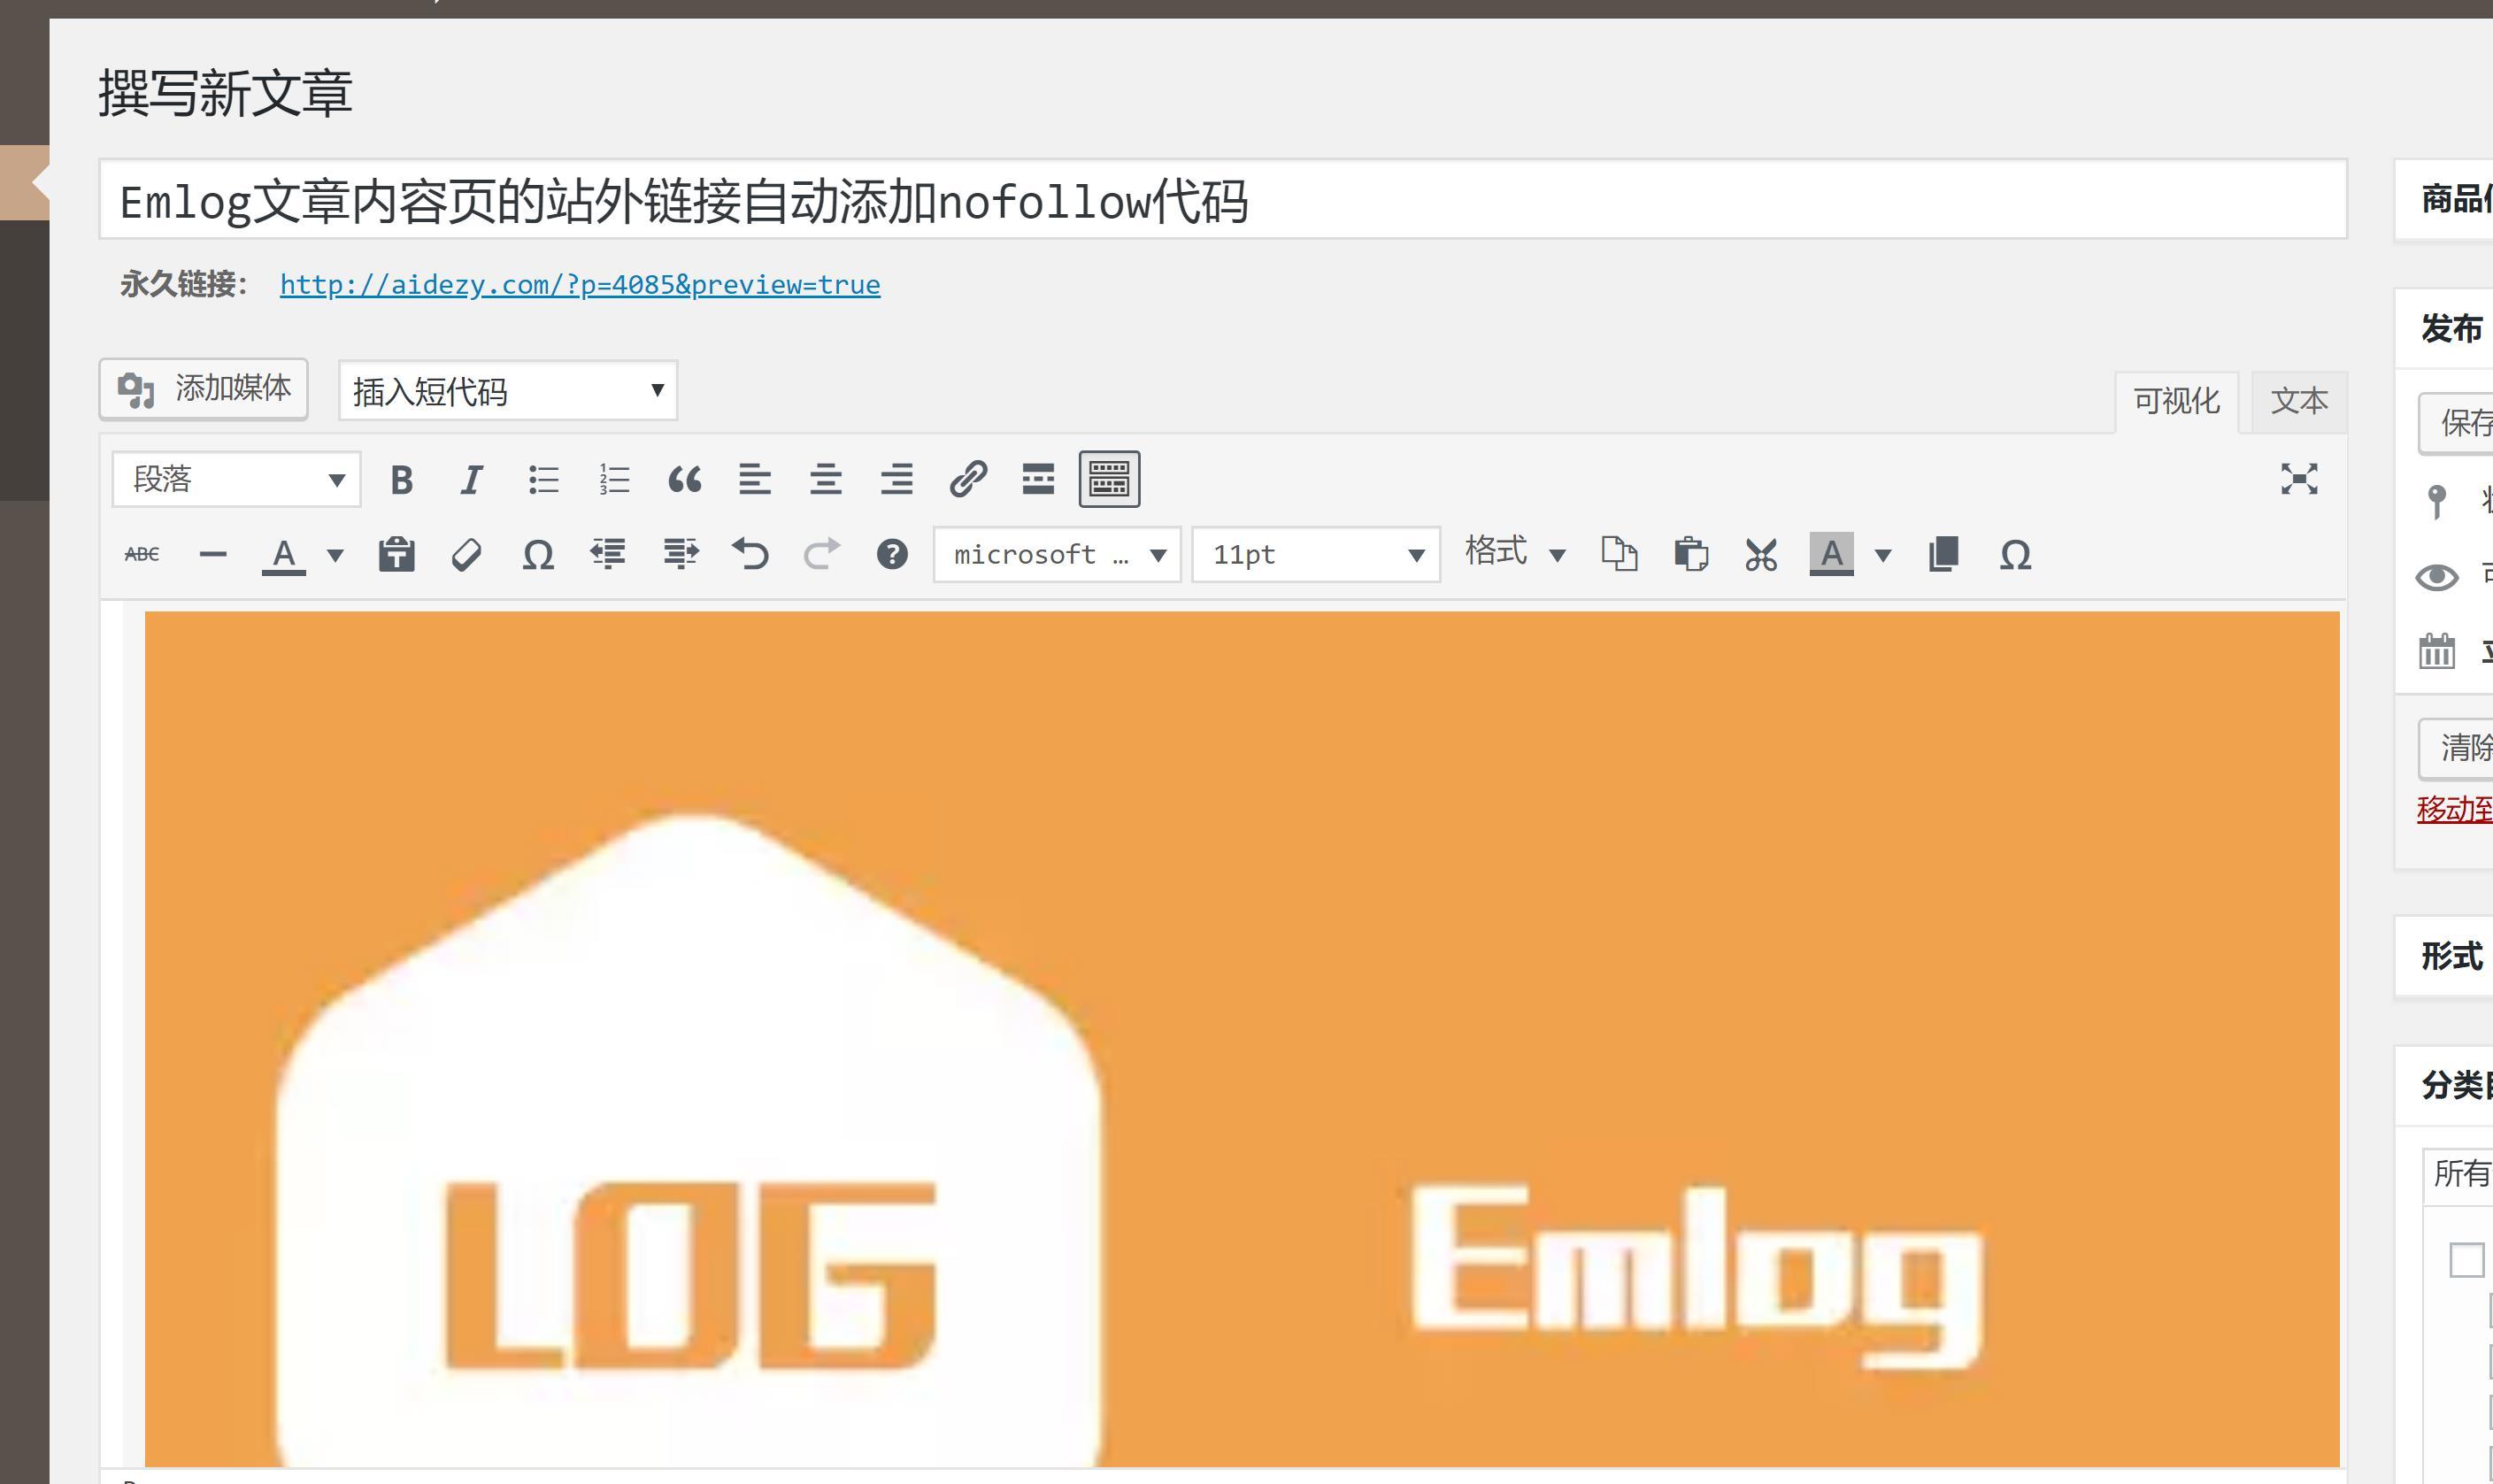 Emlog文章内容页的站外链接自动添加nofollow代码|前言